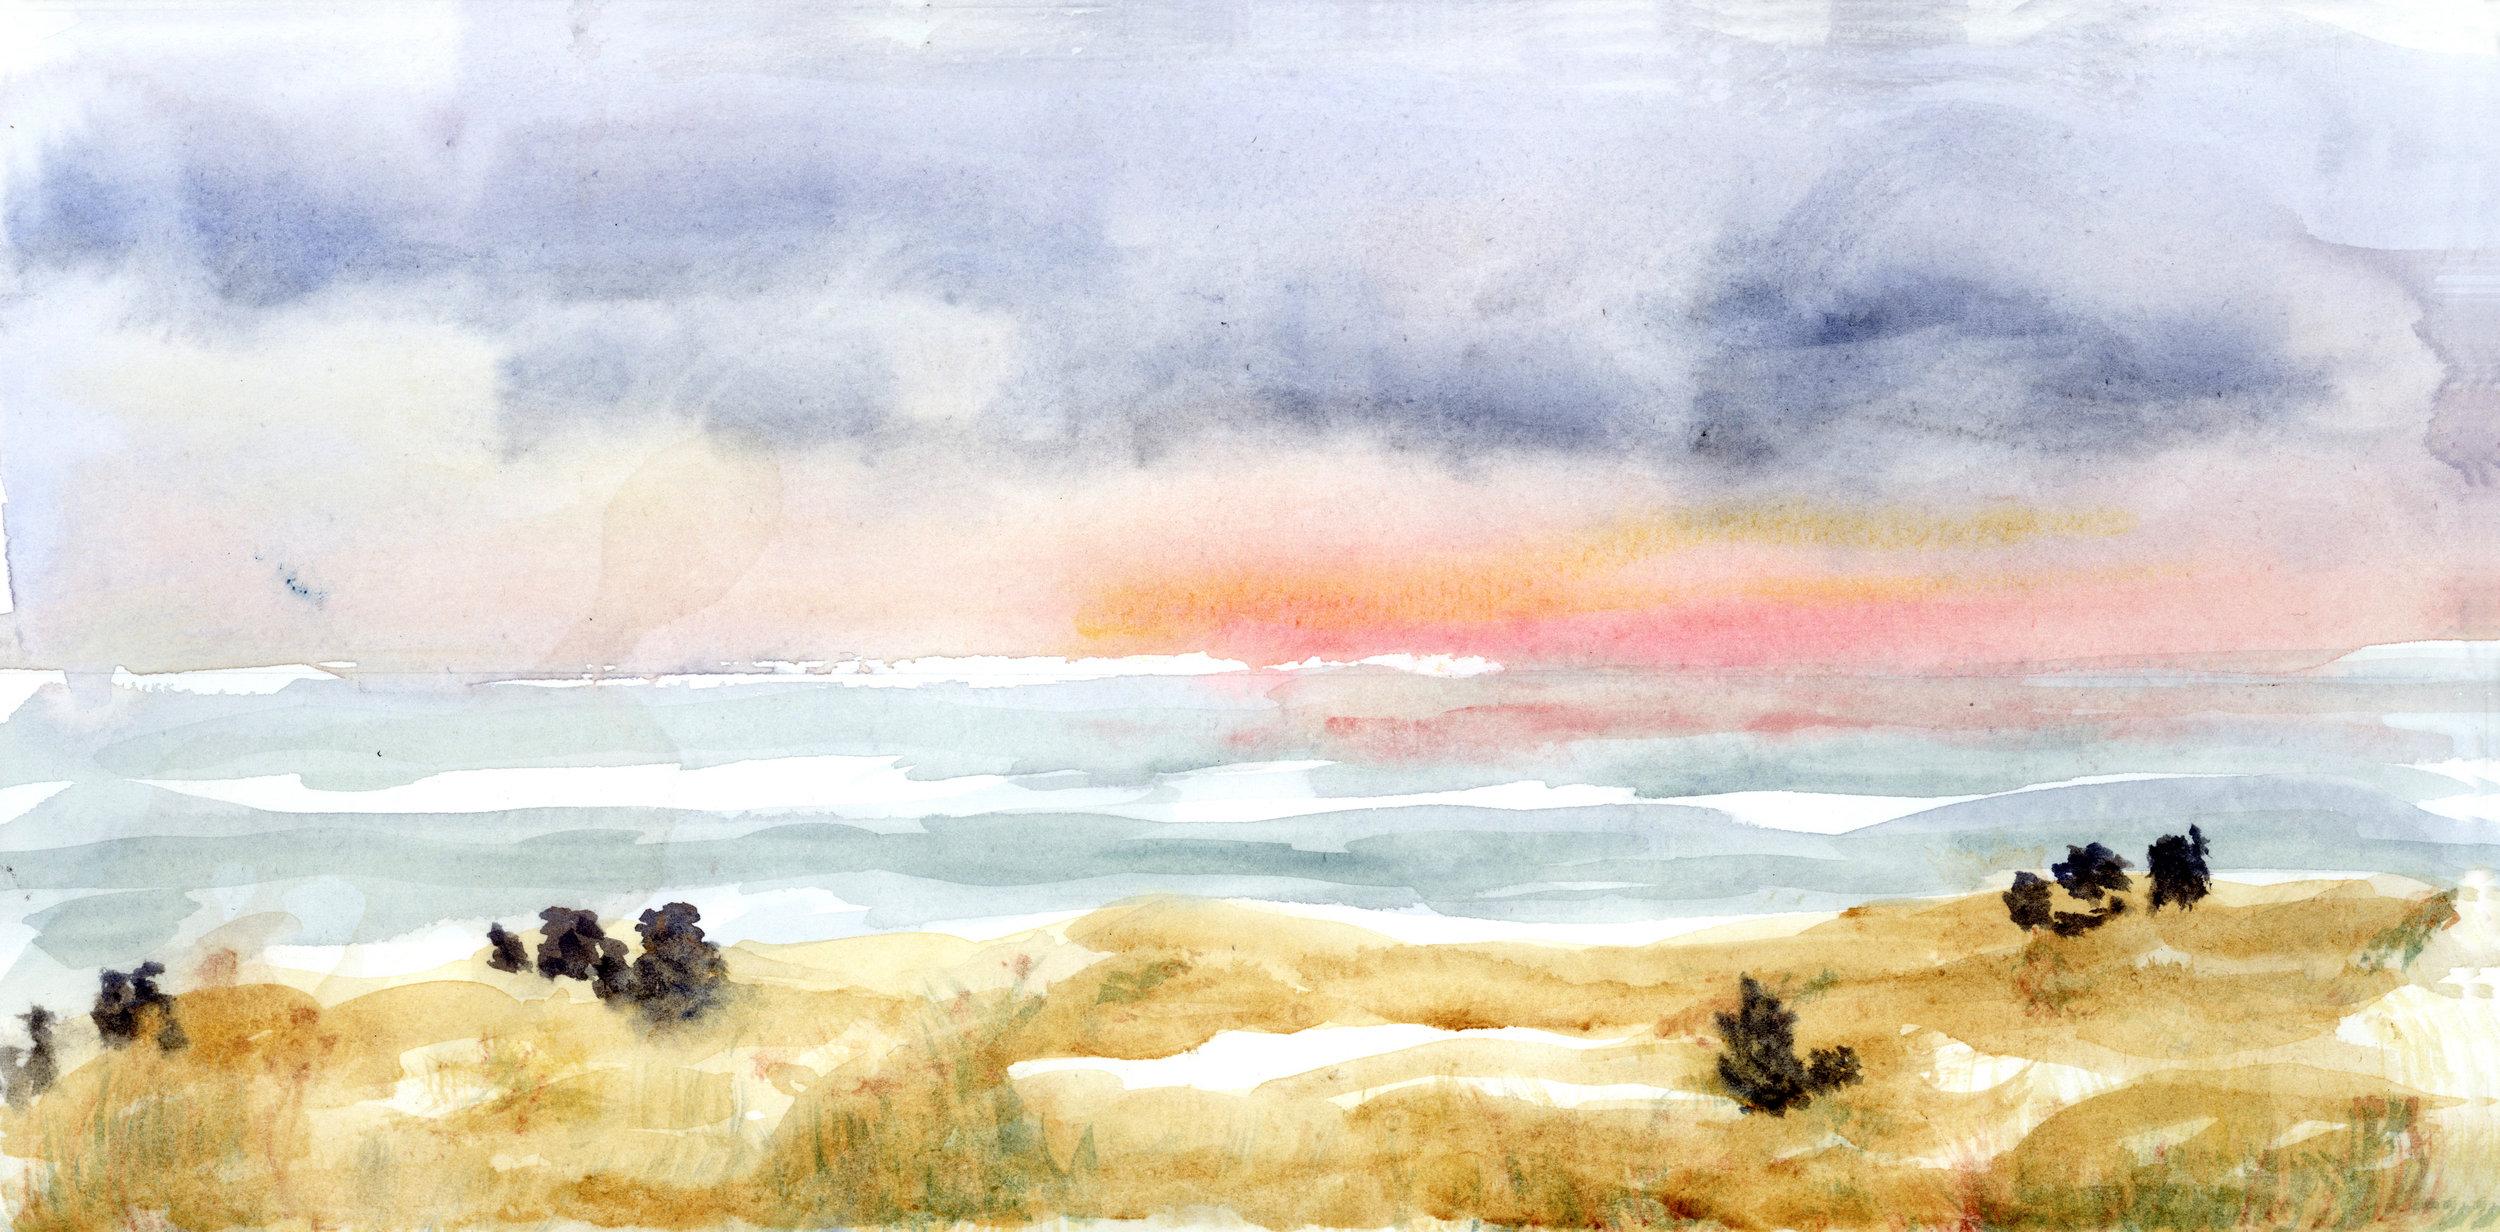 Watercolor by Anita Stephens